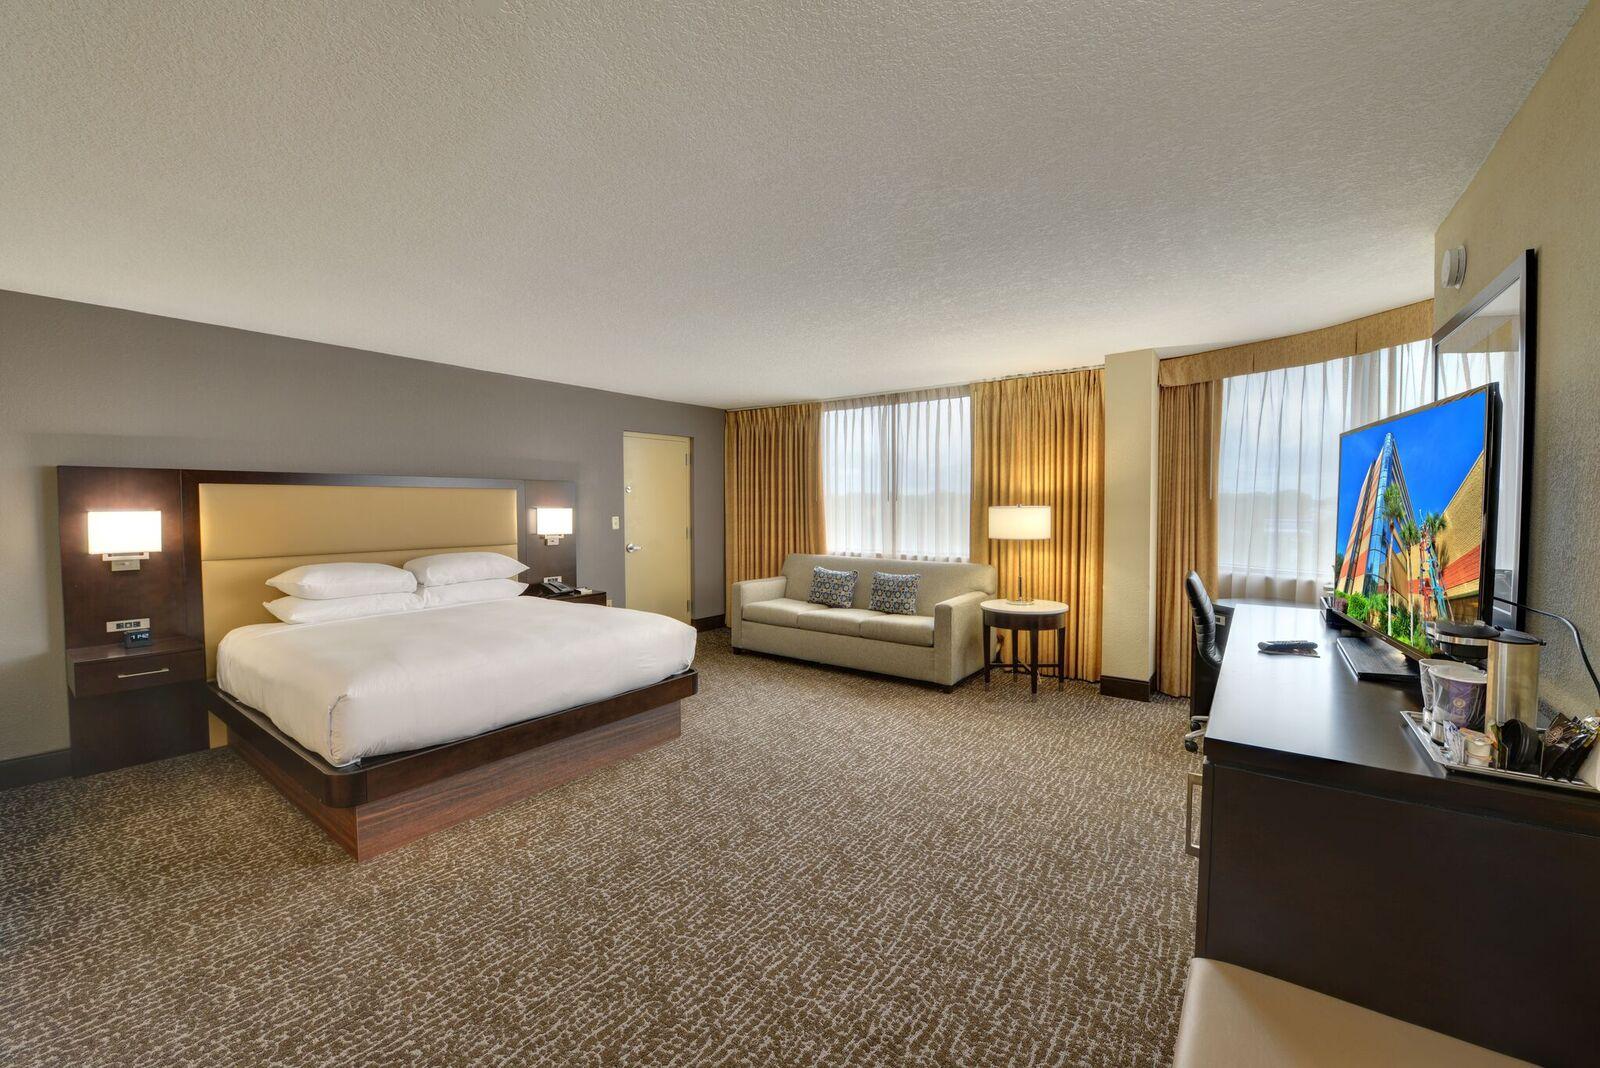 Hilton Orlando/Altamonte Springs Reinvents Hospitality with $5.6 ...